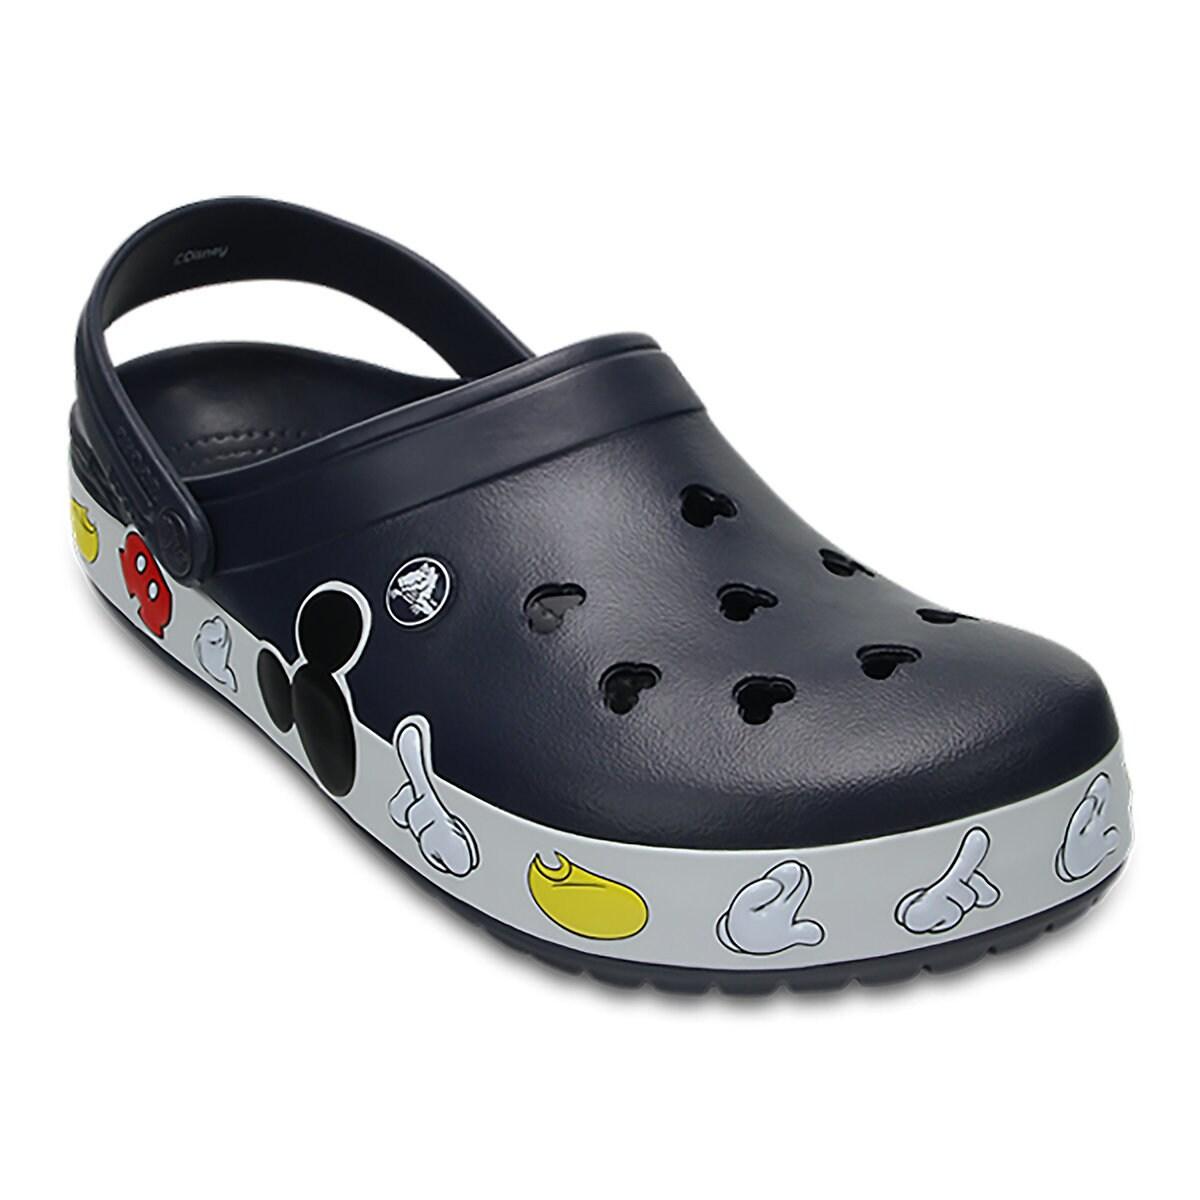 f0b7e9b71e77 Product Image of Mickey Mouse Crocs™ Clogs for Men   1